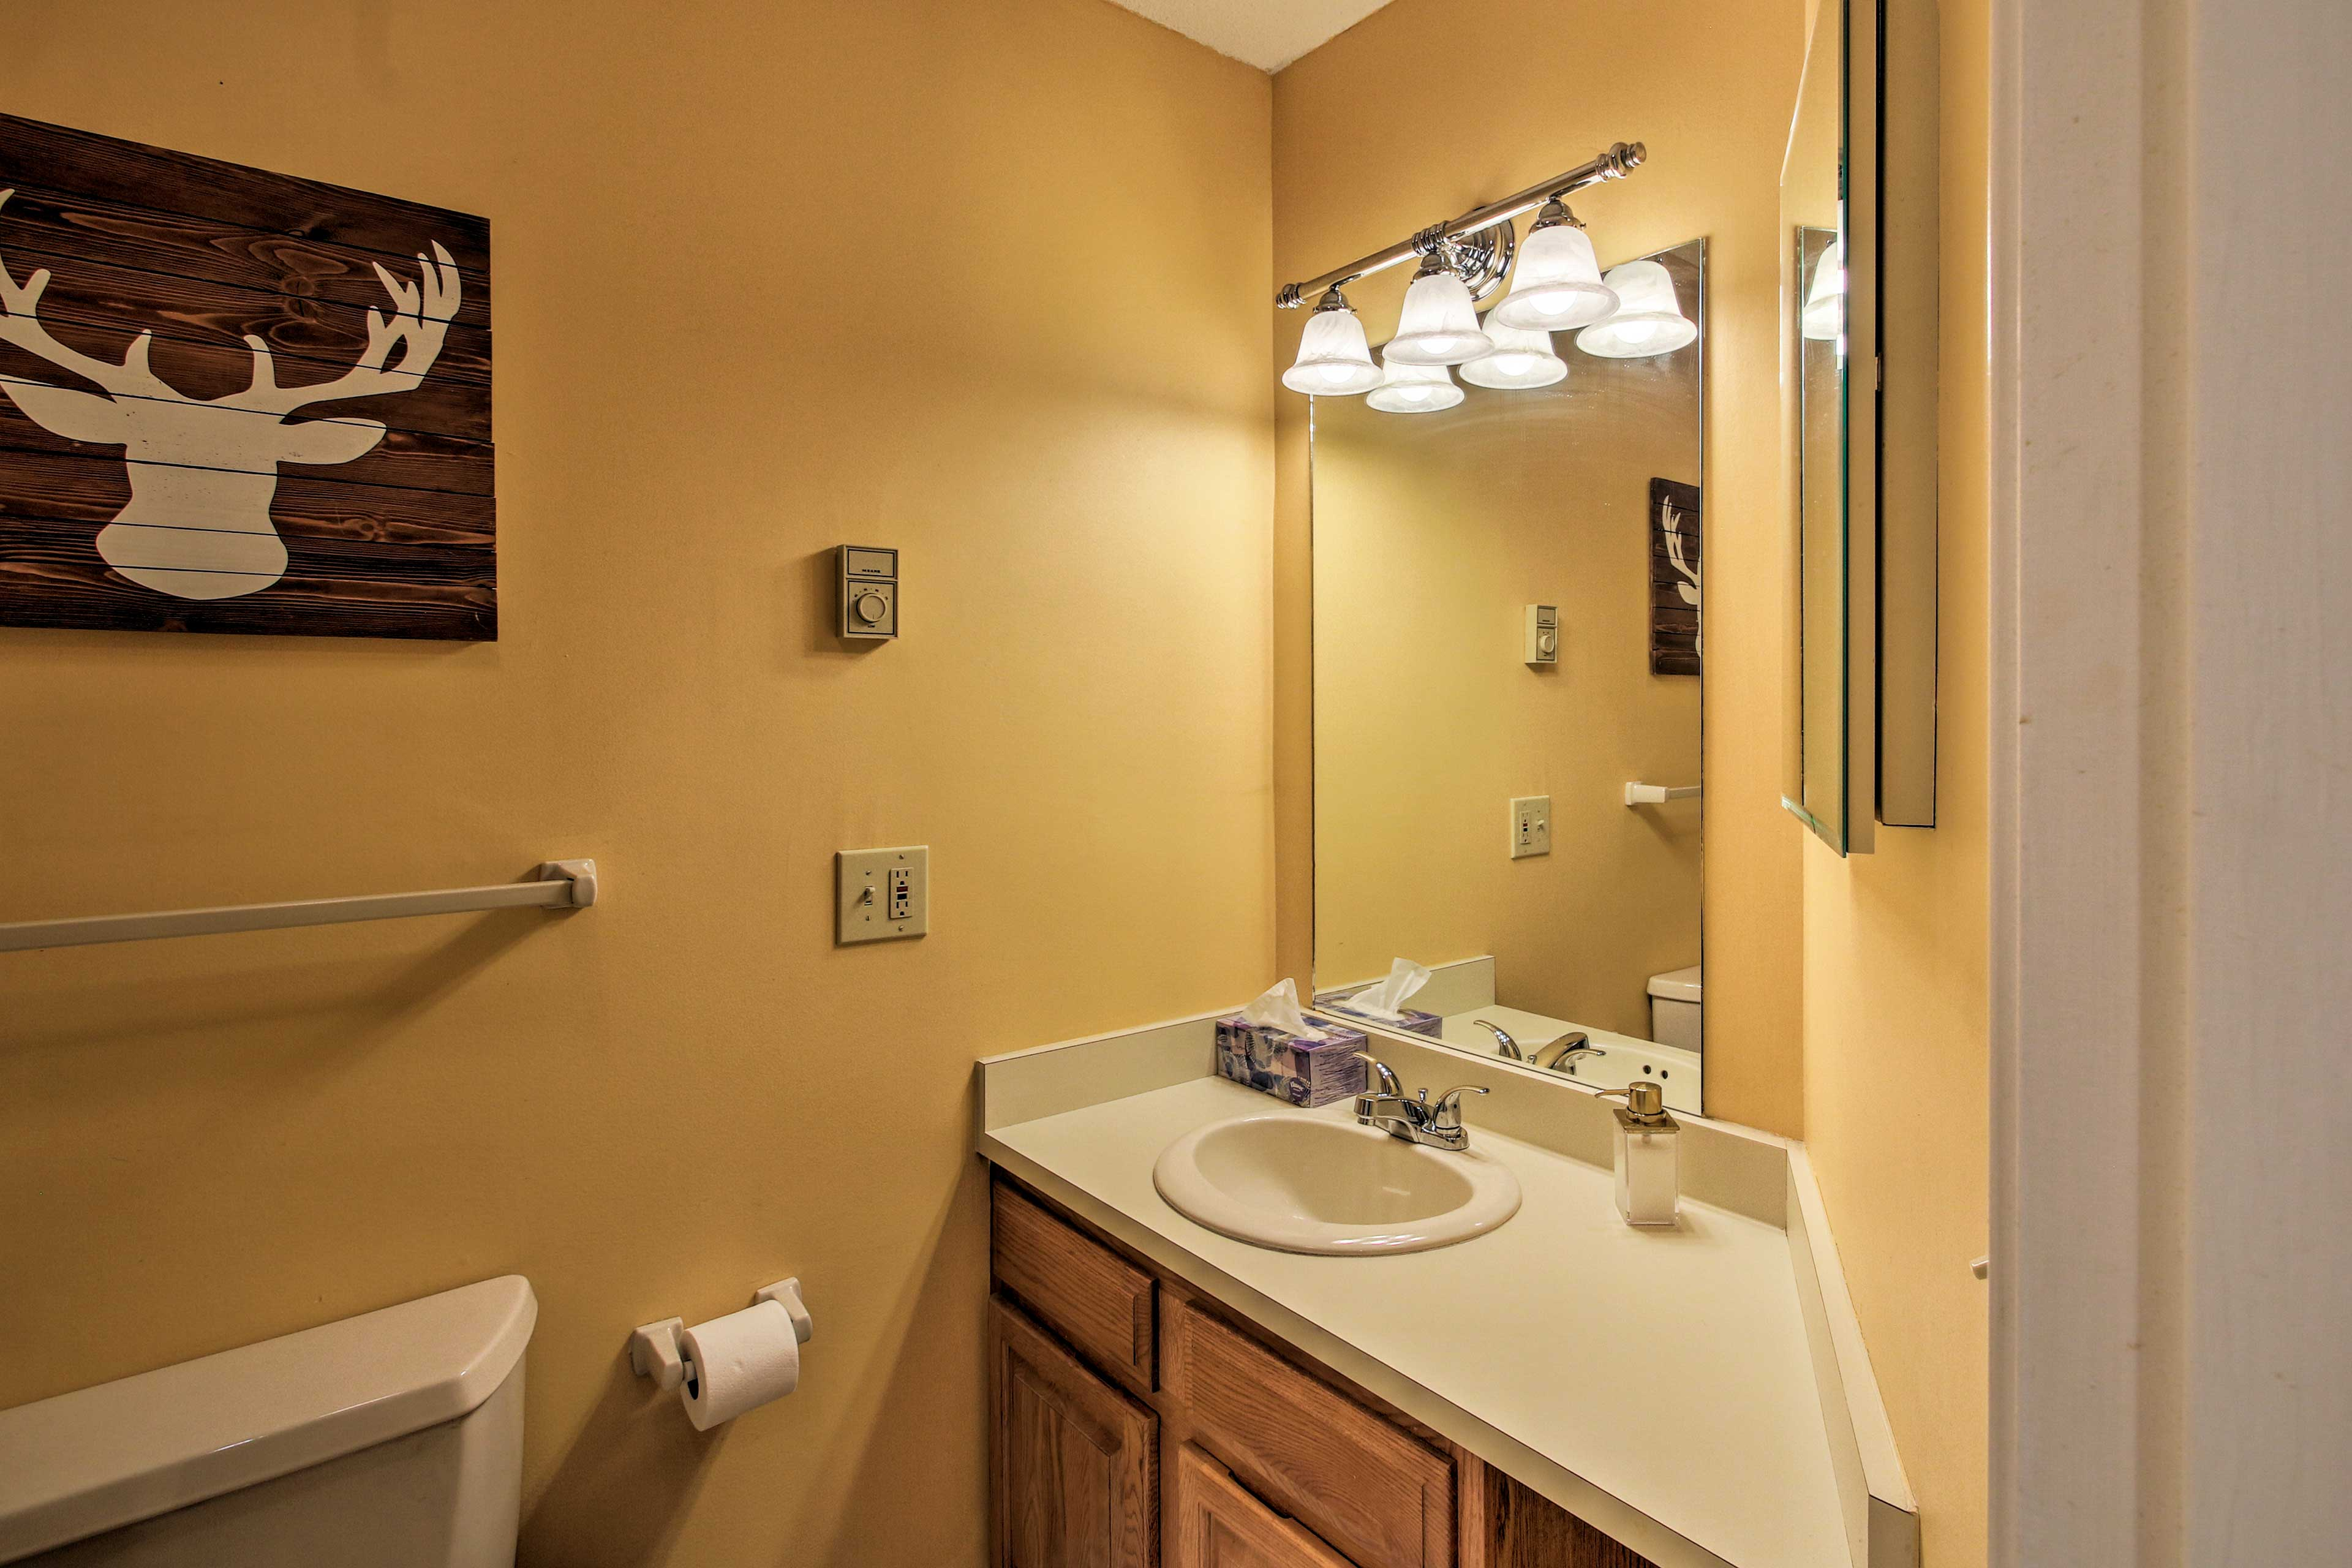 The condo has a total of 2 bathrooms